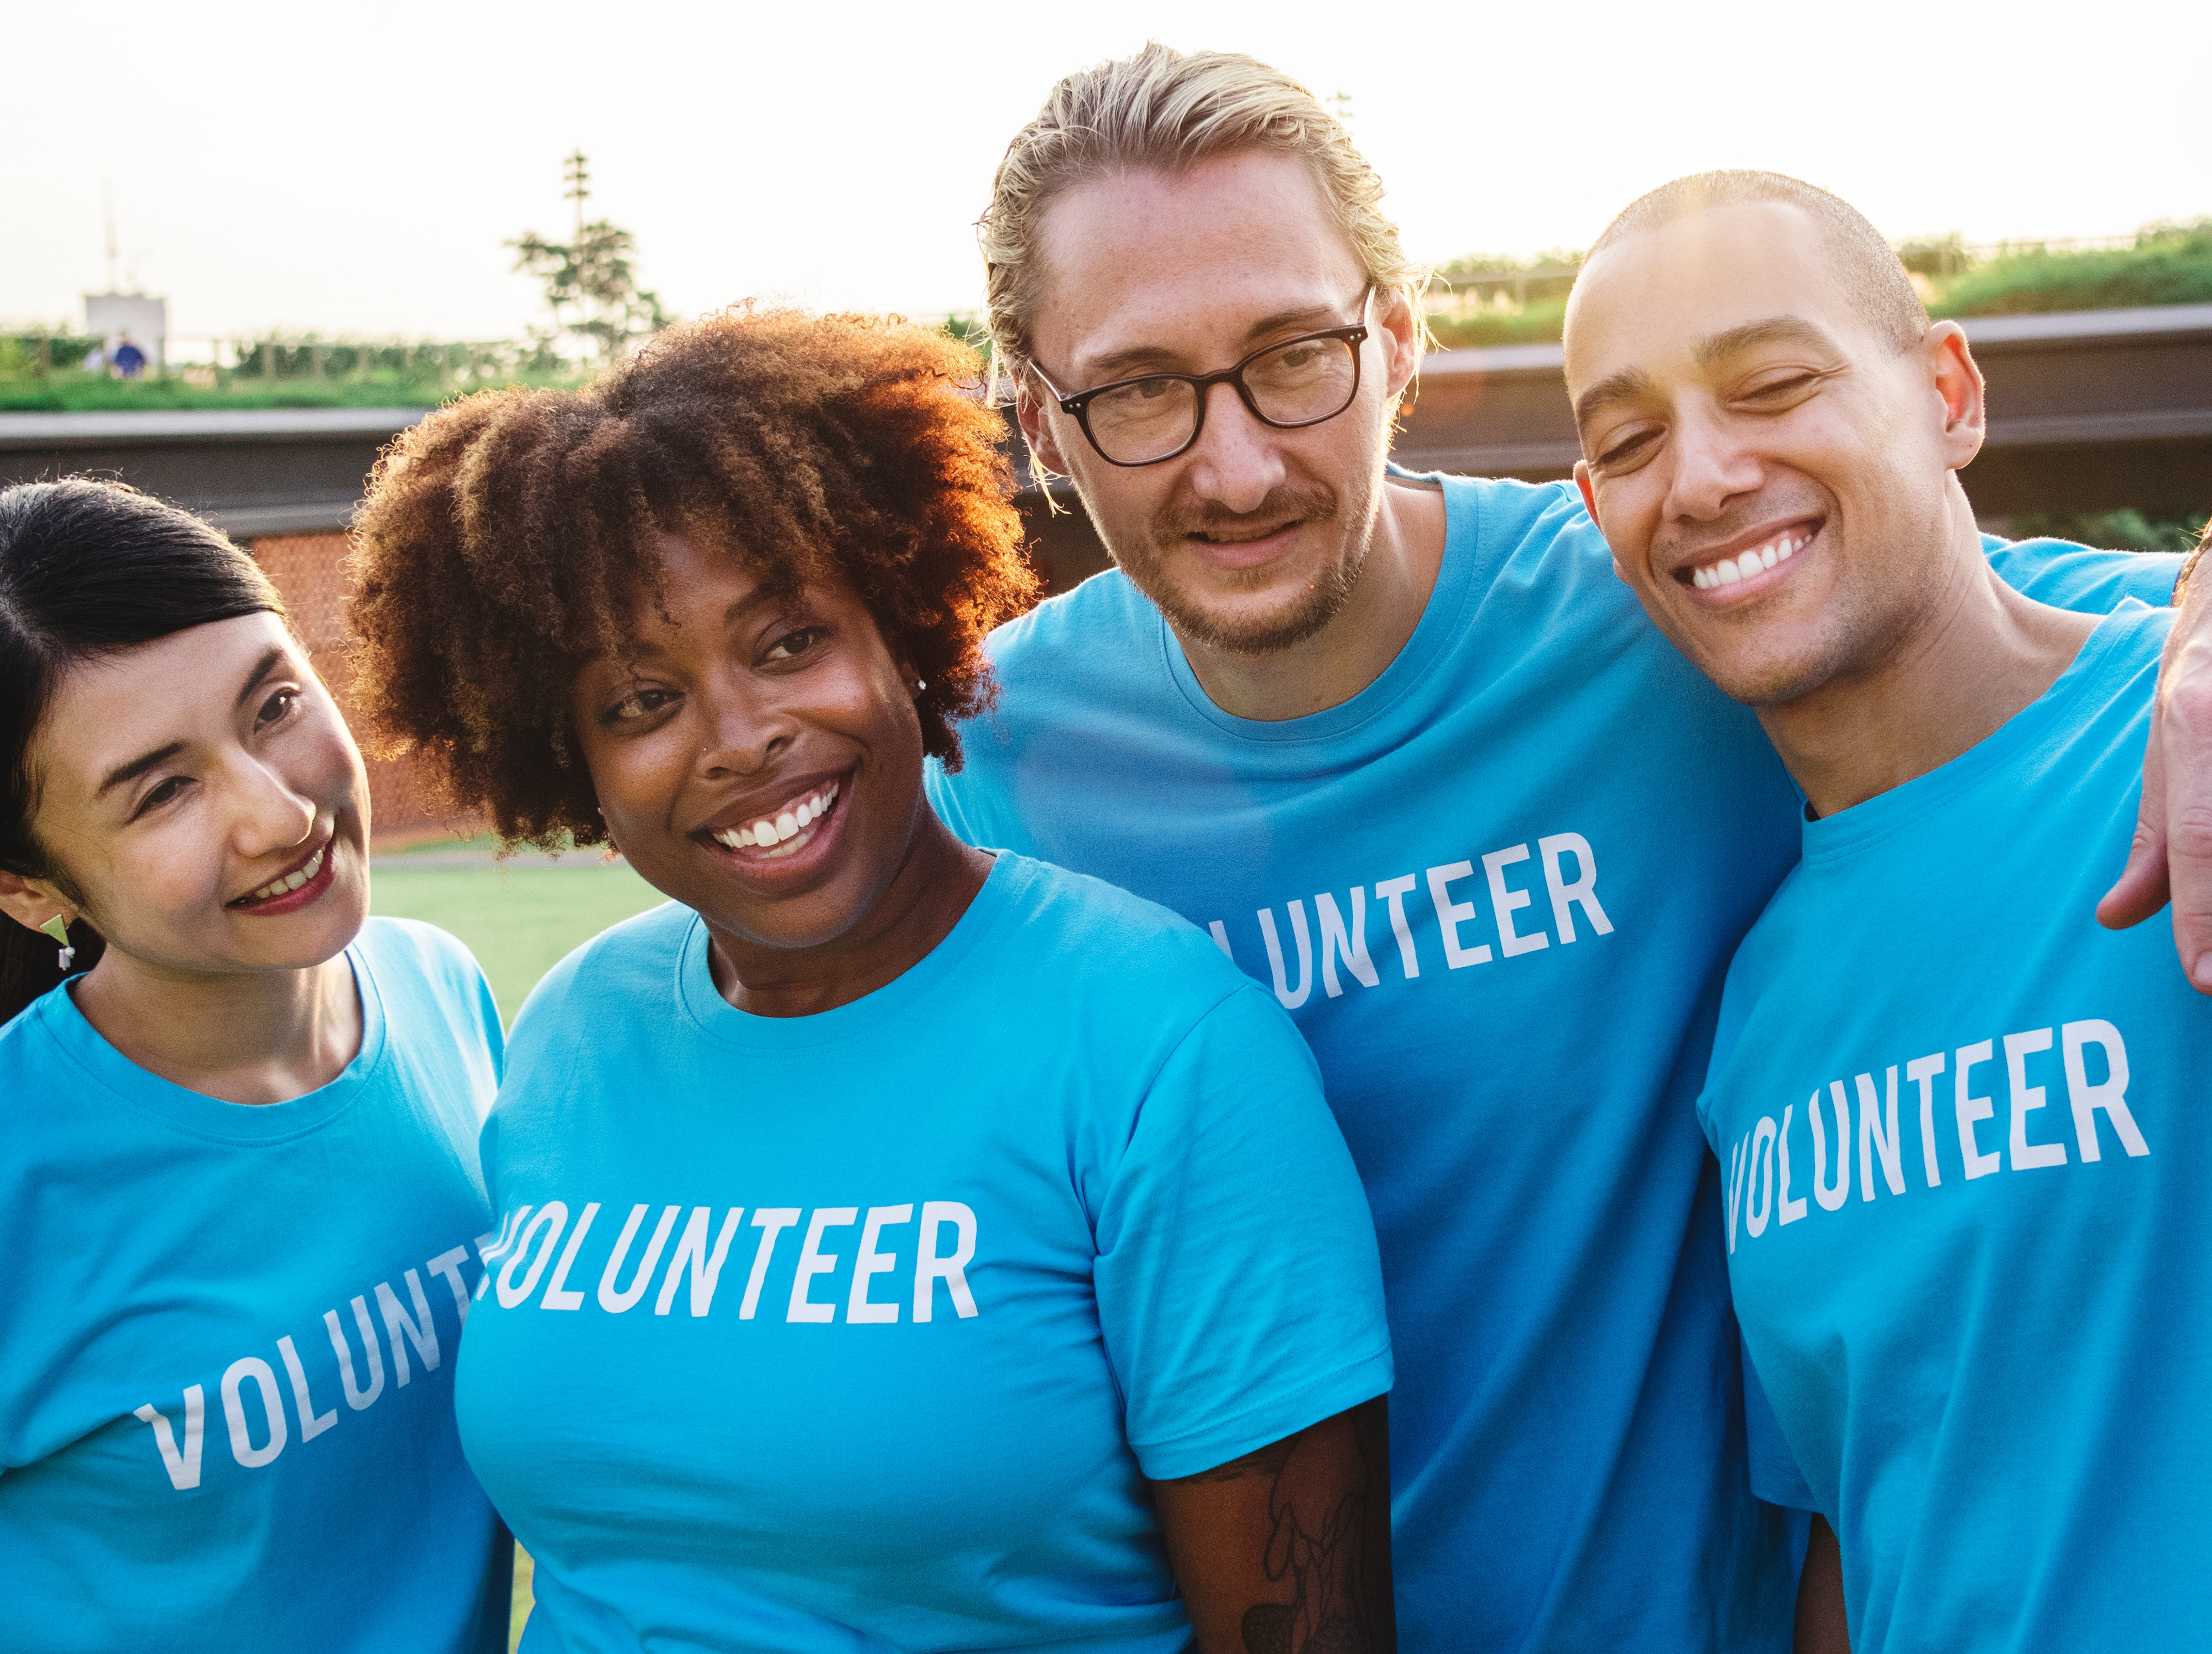 CSR Volunteers smiling